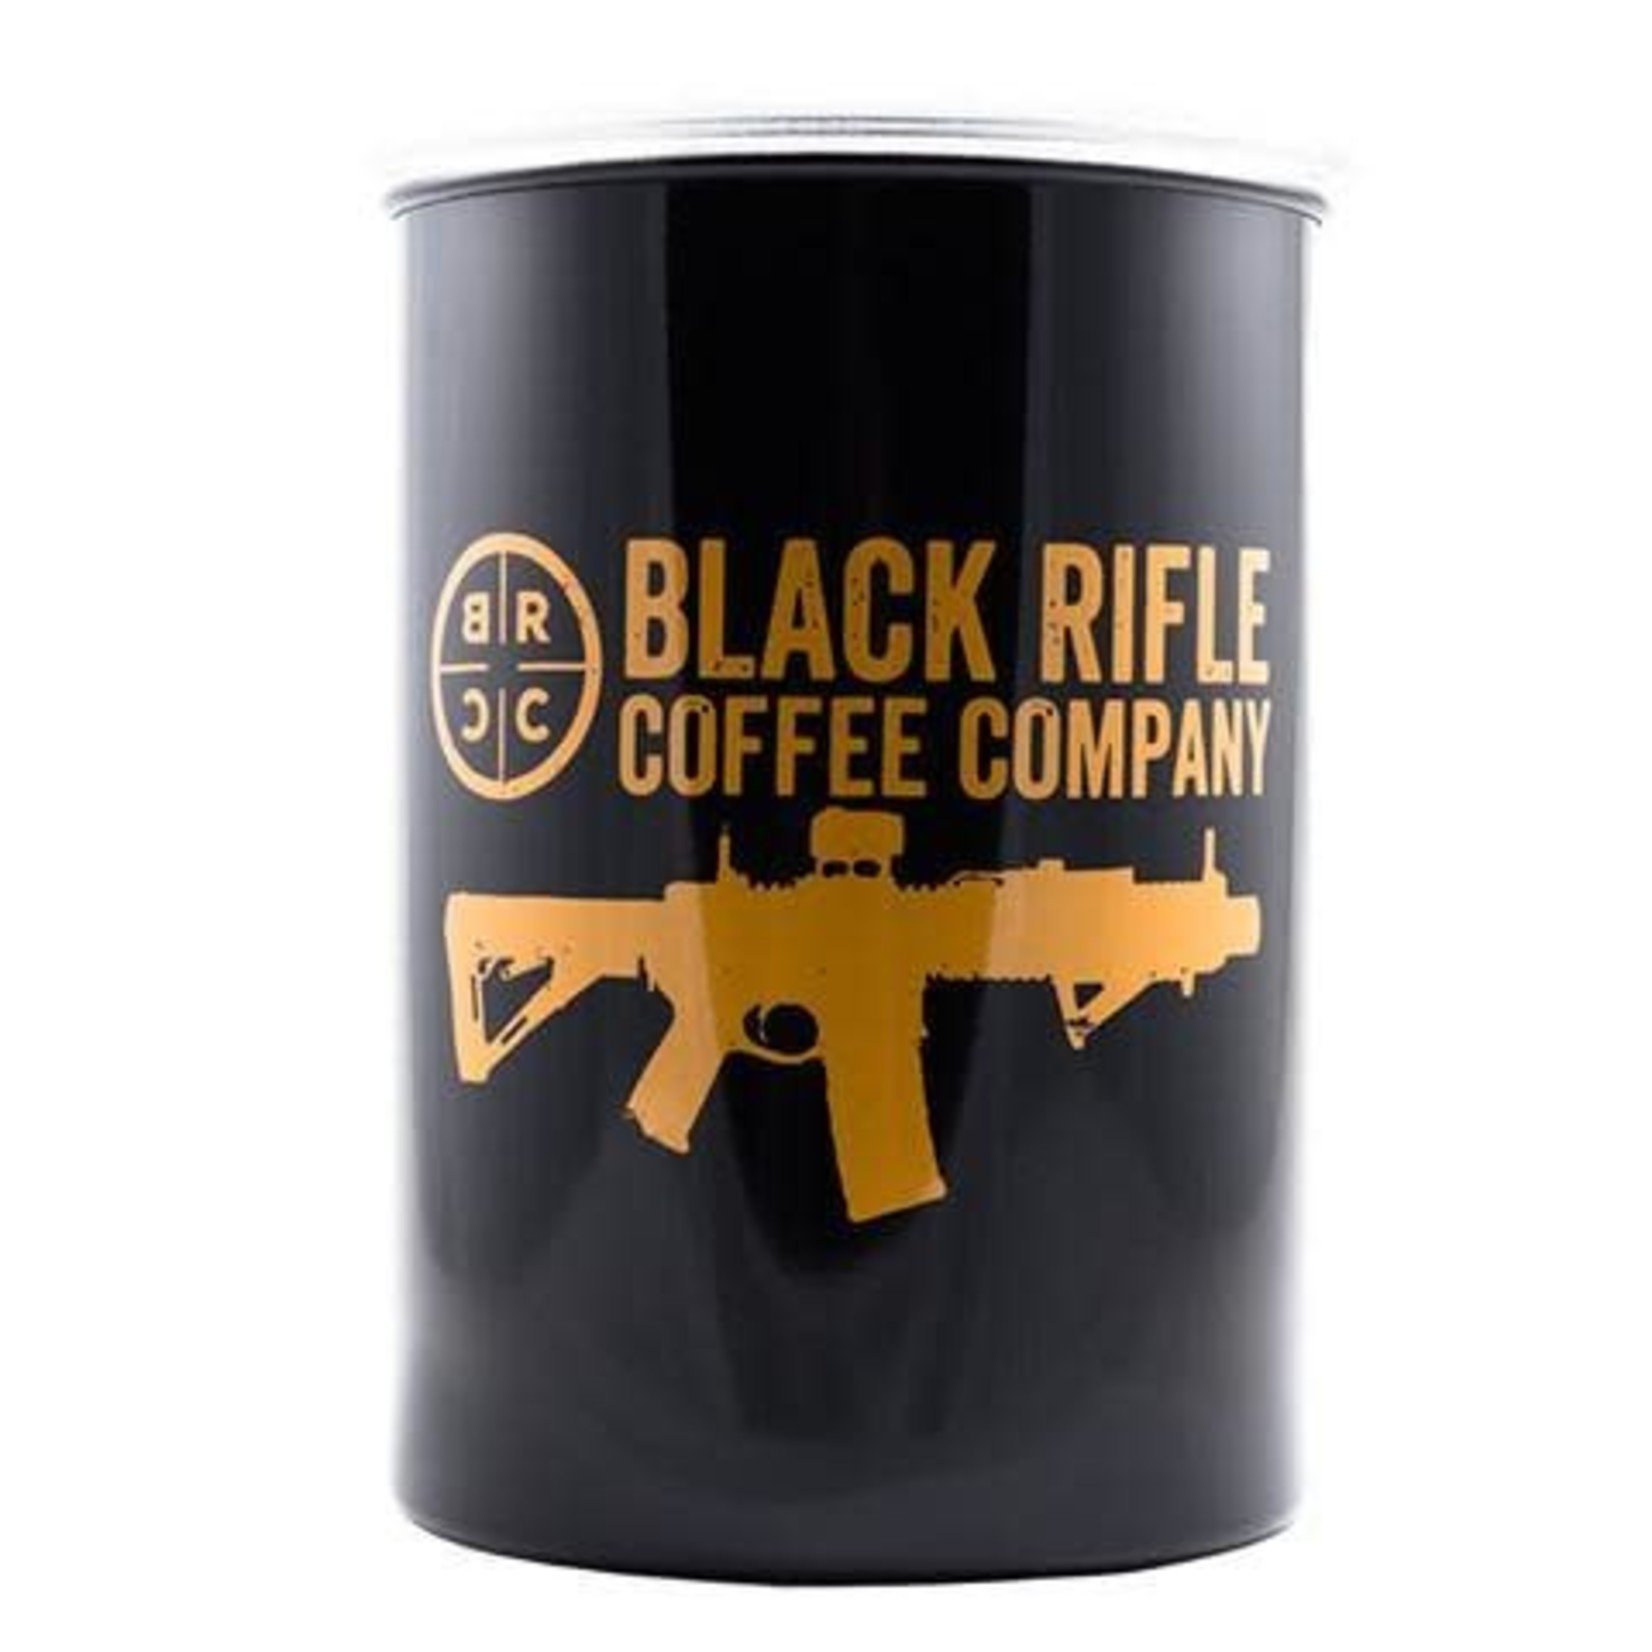 Black Rifle Coffee Black Rifle Coffee Company Airtight Container - Black